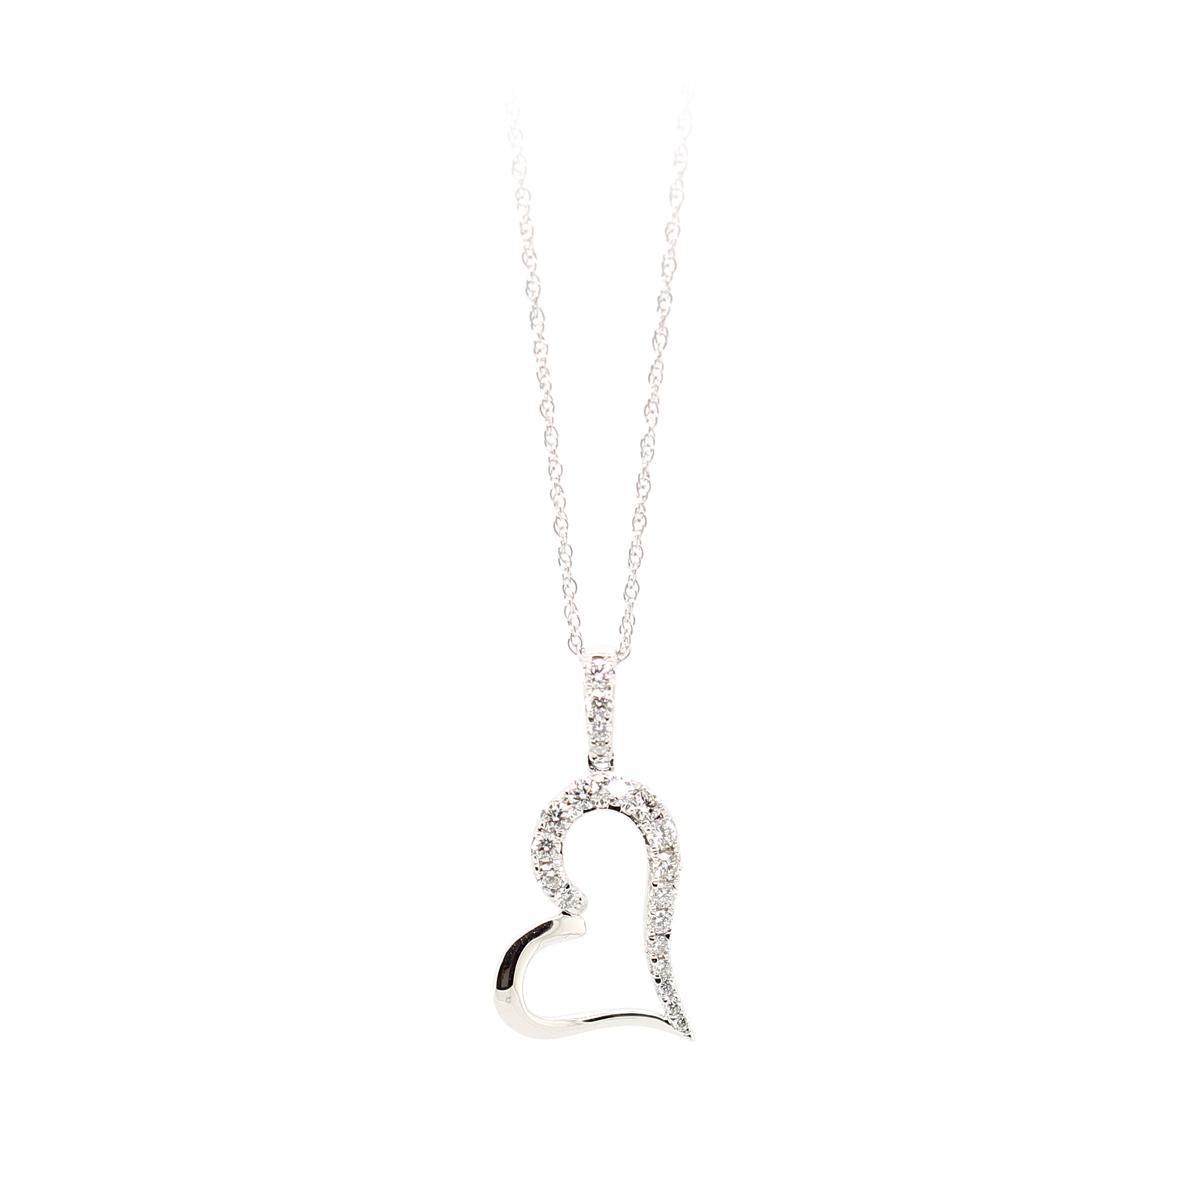 18 Karat White Gold Cutout Small Heart Diamond Pendant Necklace